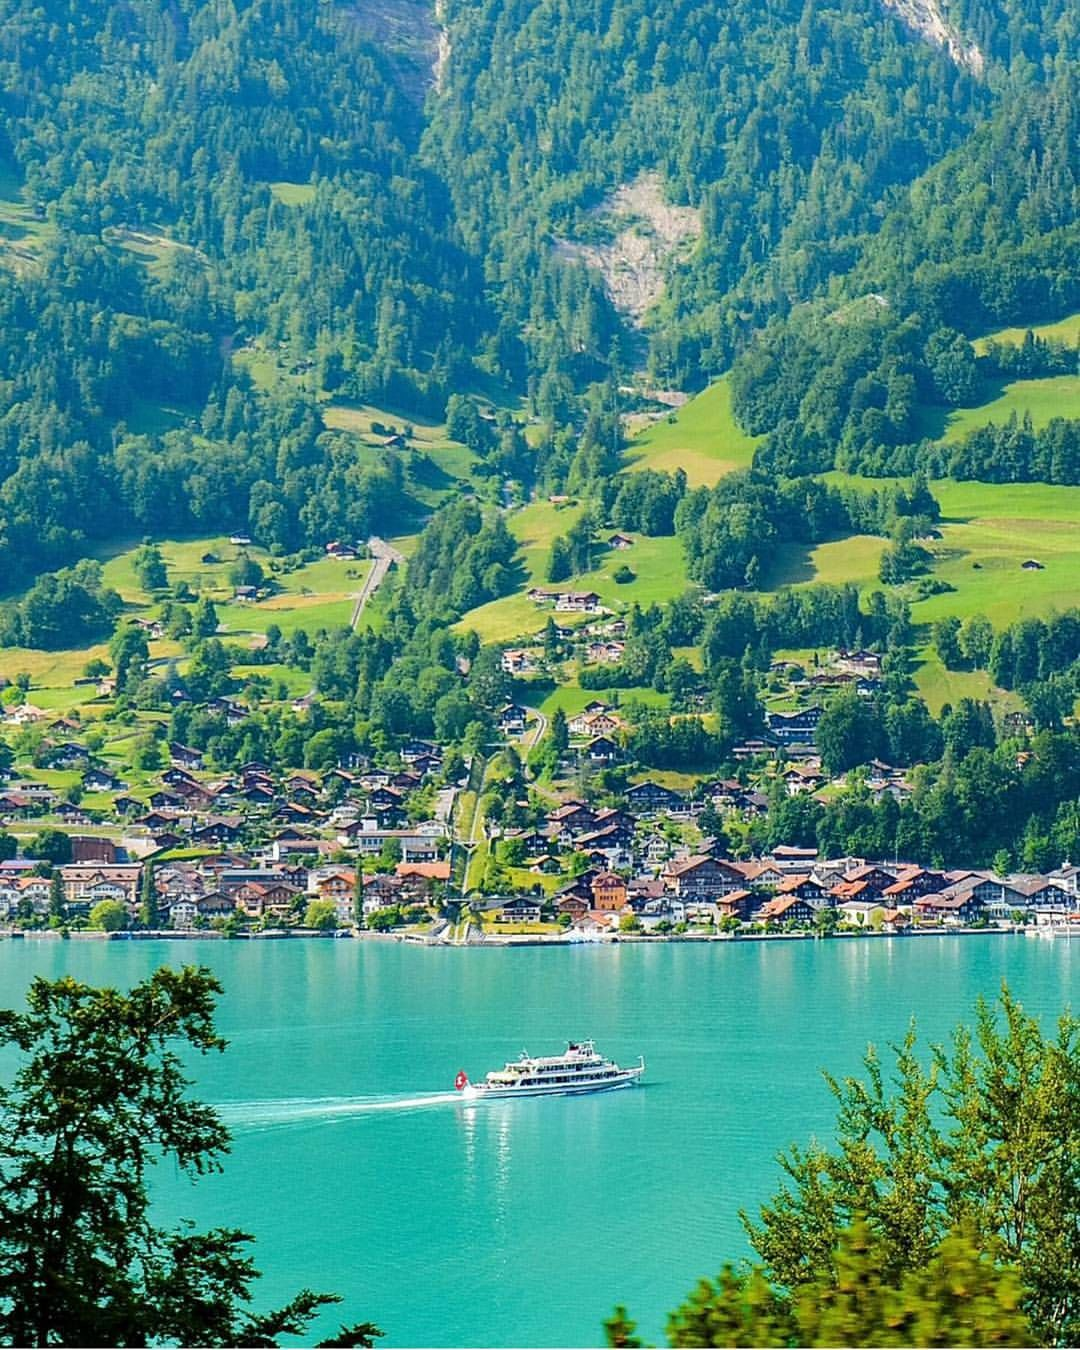 Amazing Places To Stay Switzerland: Lake Brienz, Switzerland